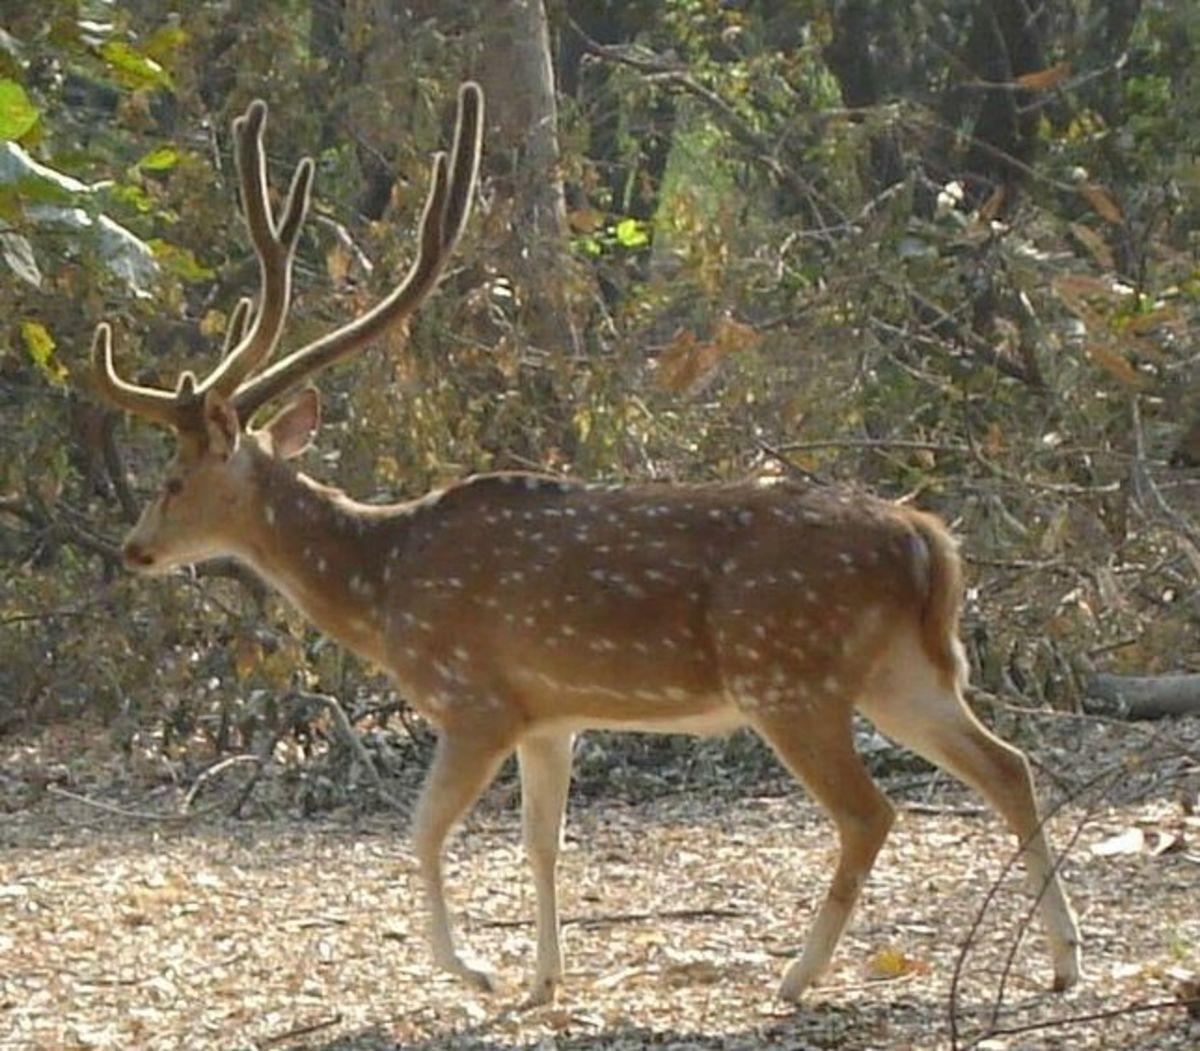 Hangul Kashmir stag from the Nawabganj Bird Sanctuary (on Kanpur-Lucknow road).